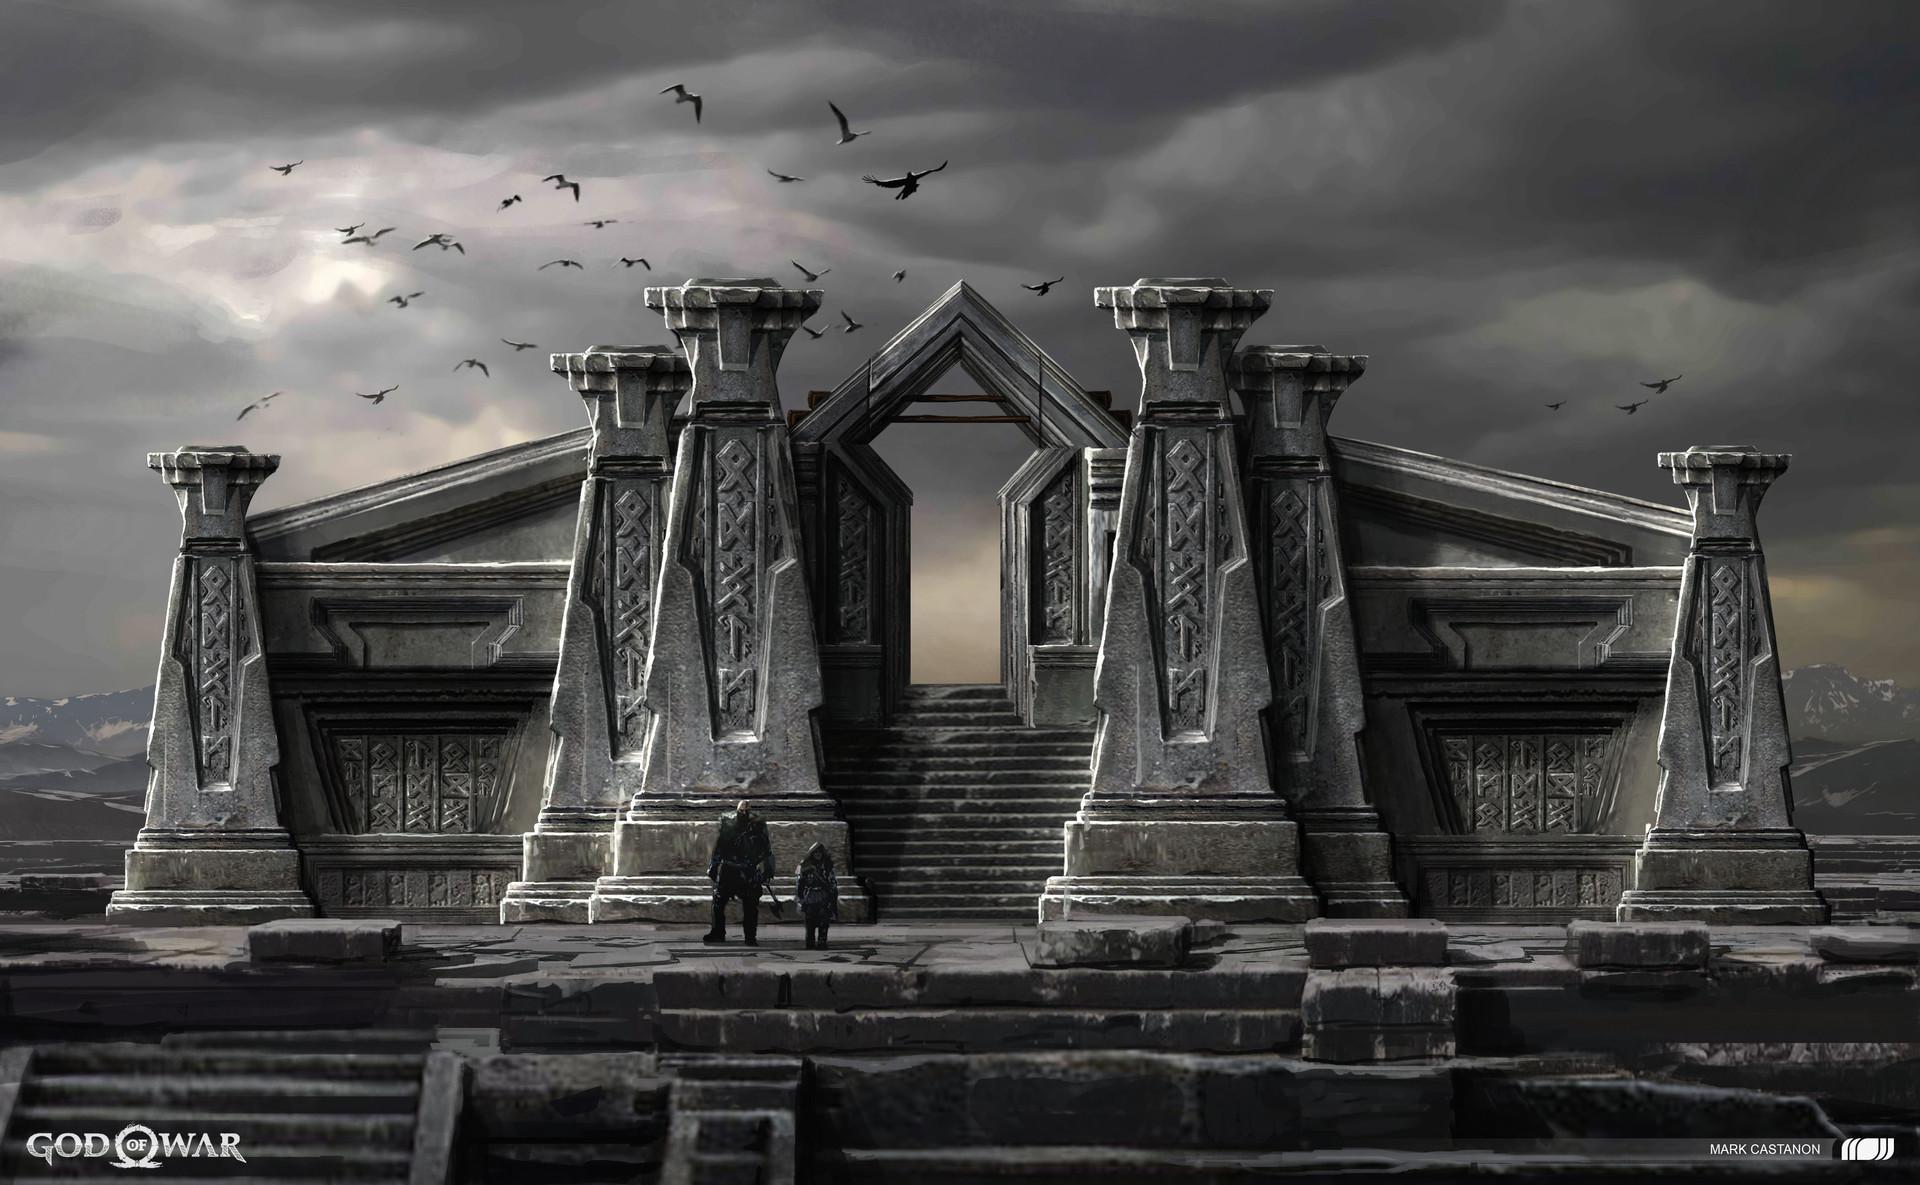 God of War Concept Art by Mark Castanon